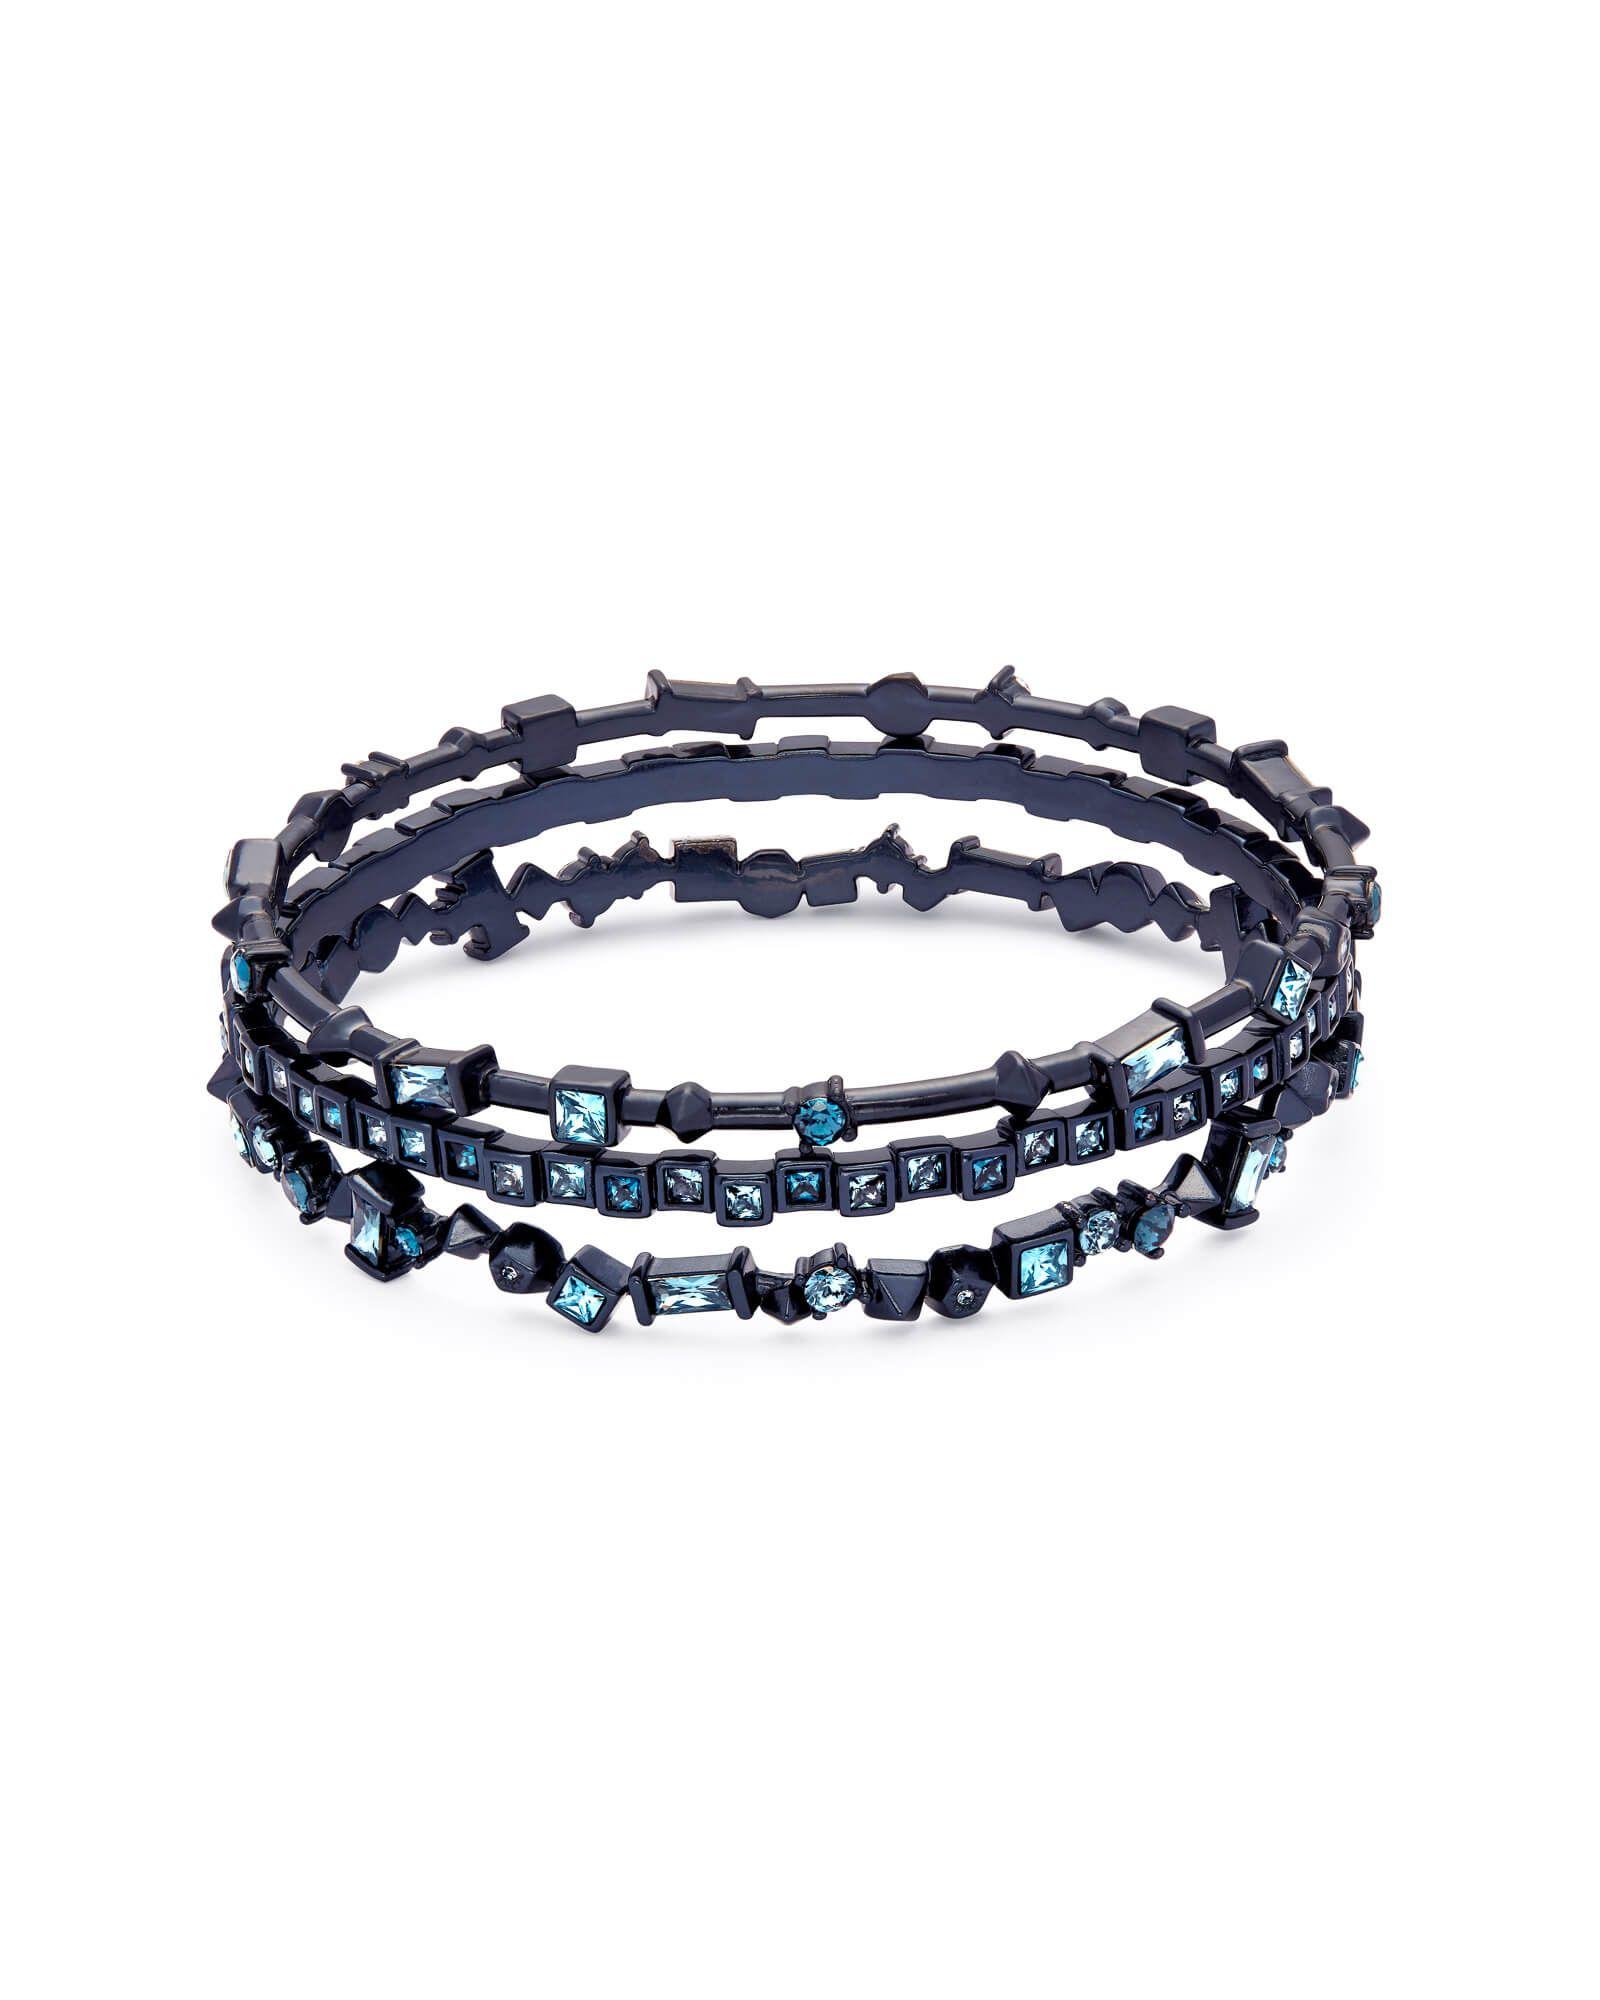 c2f5efa56f0841 Kendra Scott | Malia Navy Gunmetal Bangle Bracelet Set in Indigo Mix ...